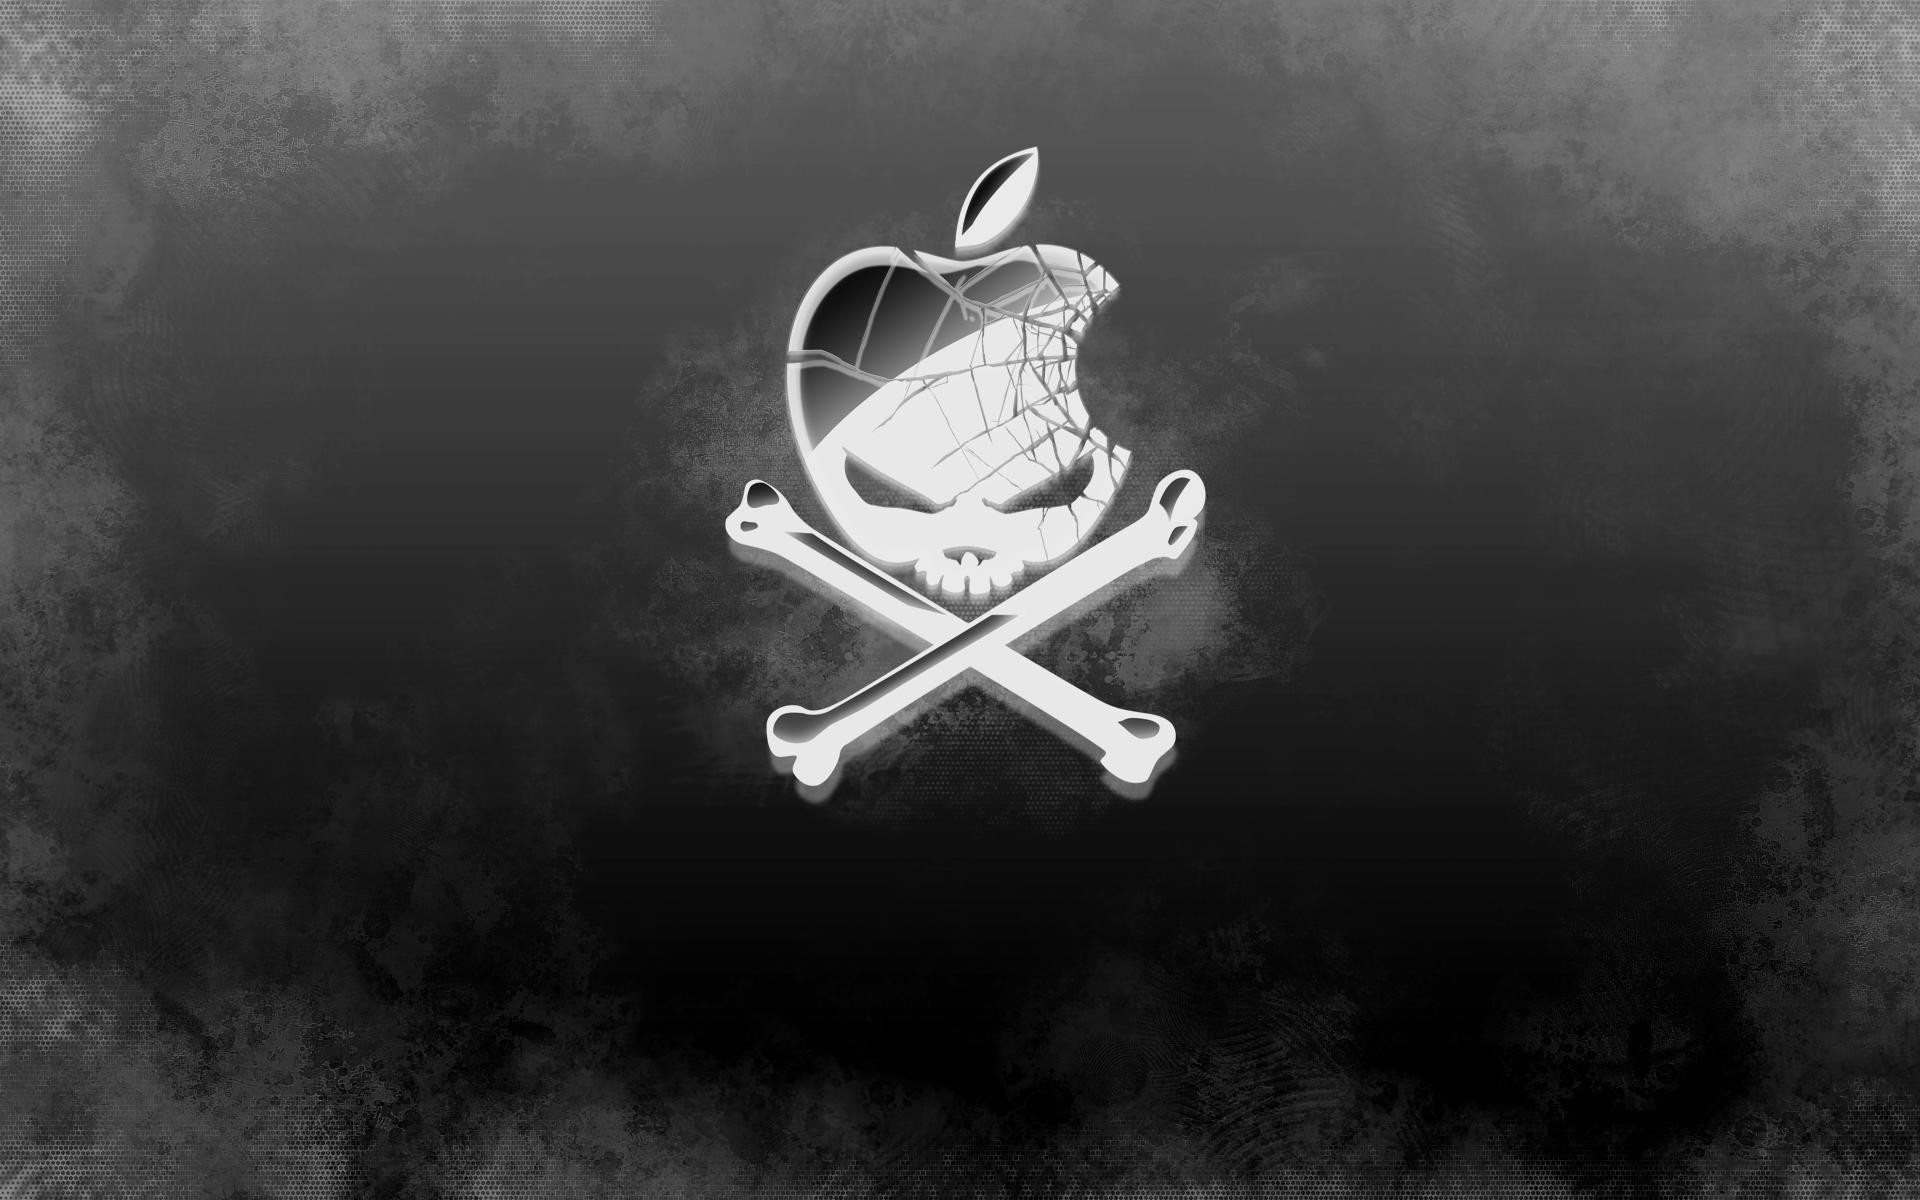 apple logo wallpaper black. 1920x1200 abstract wallpaper . apple logo black